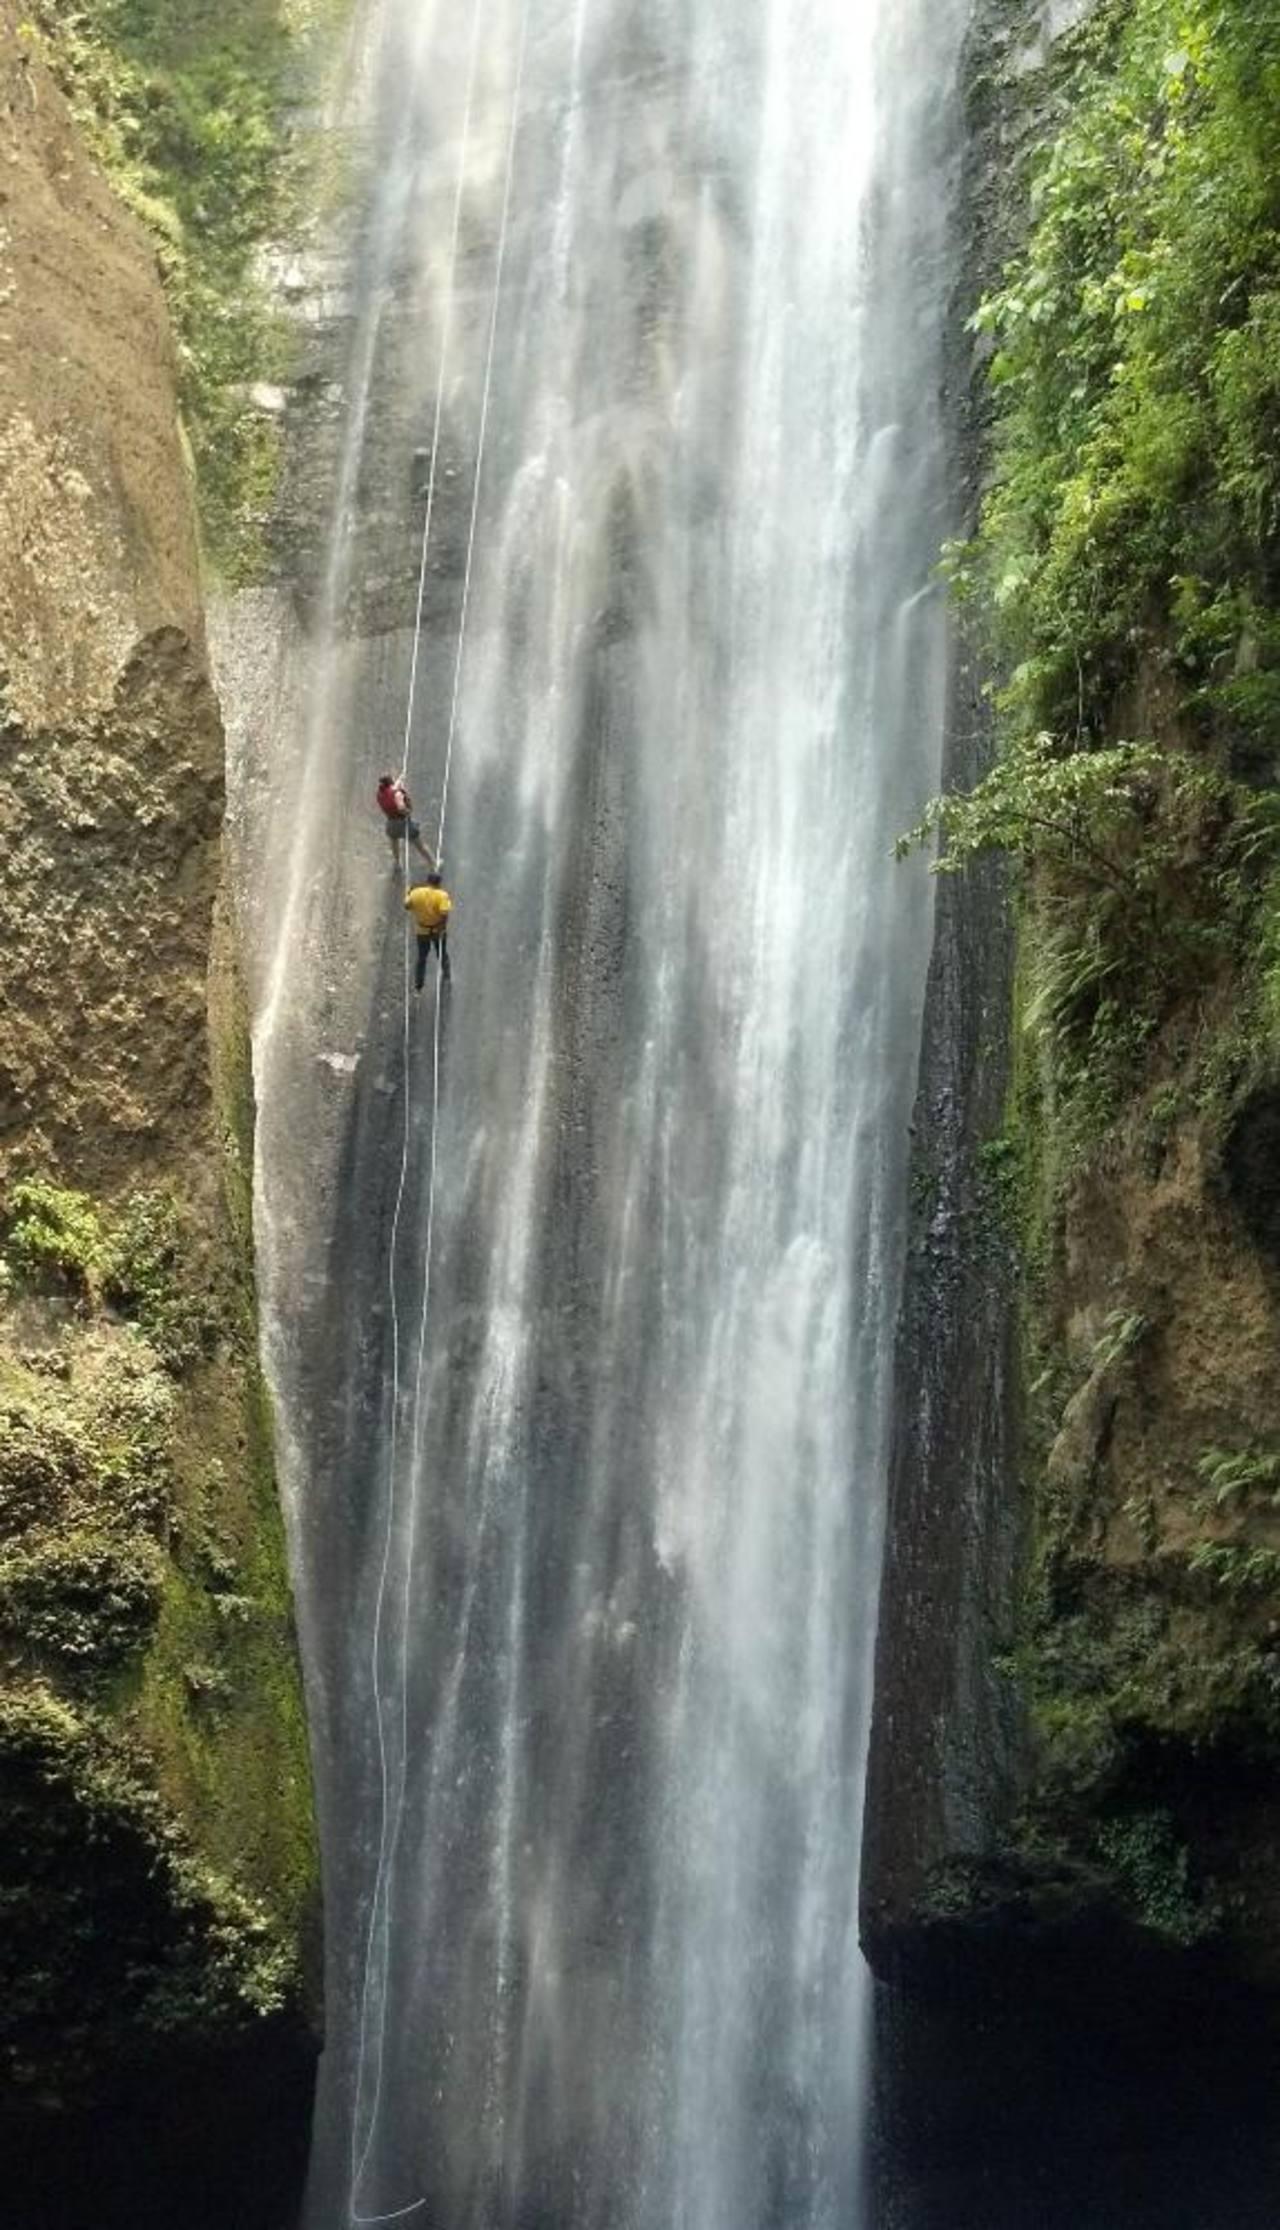 Rapel: aventura entre montañas y cascadas